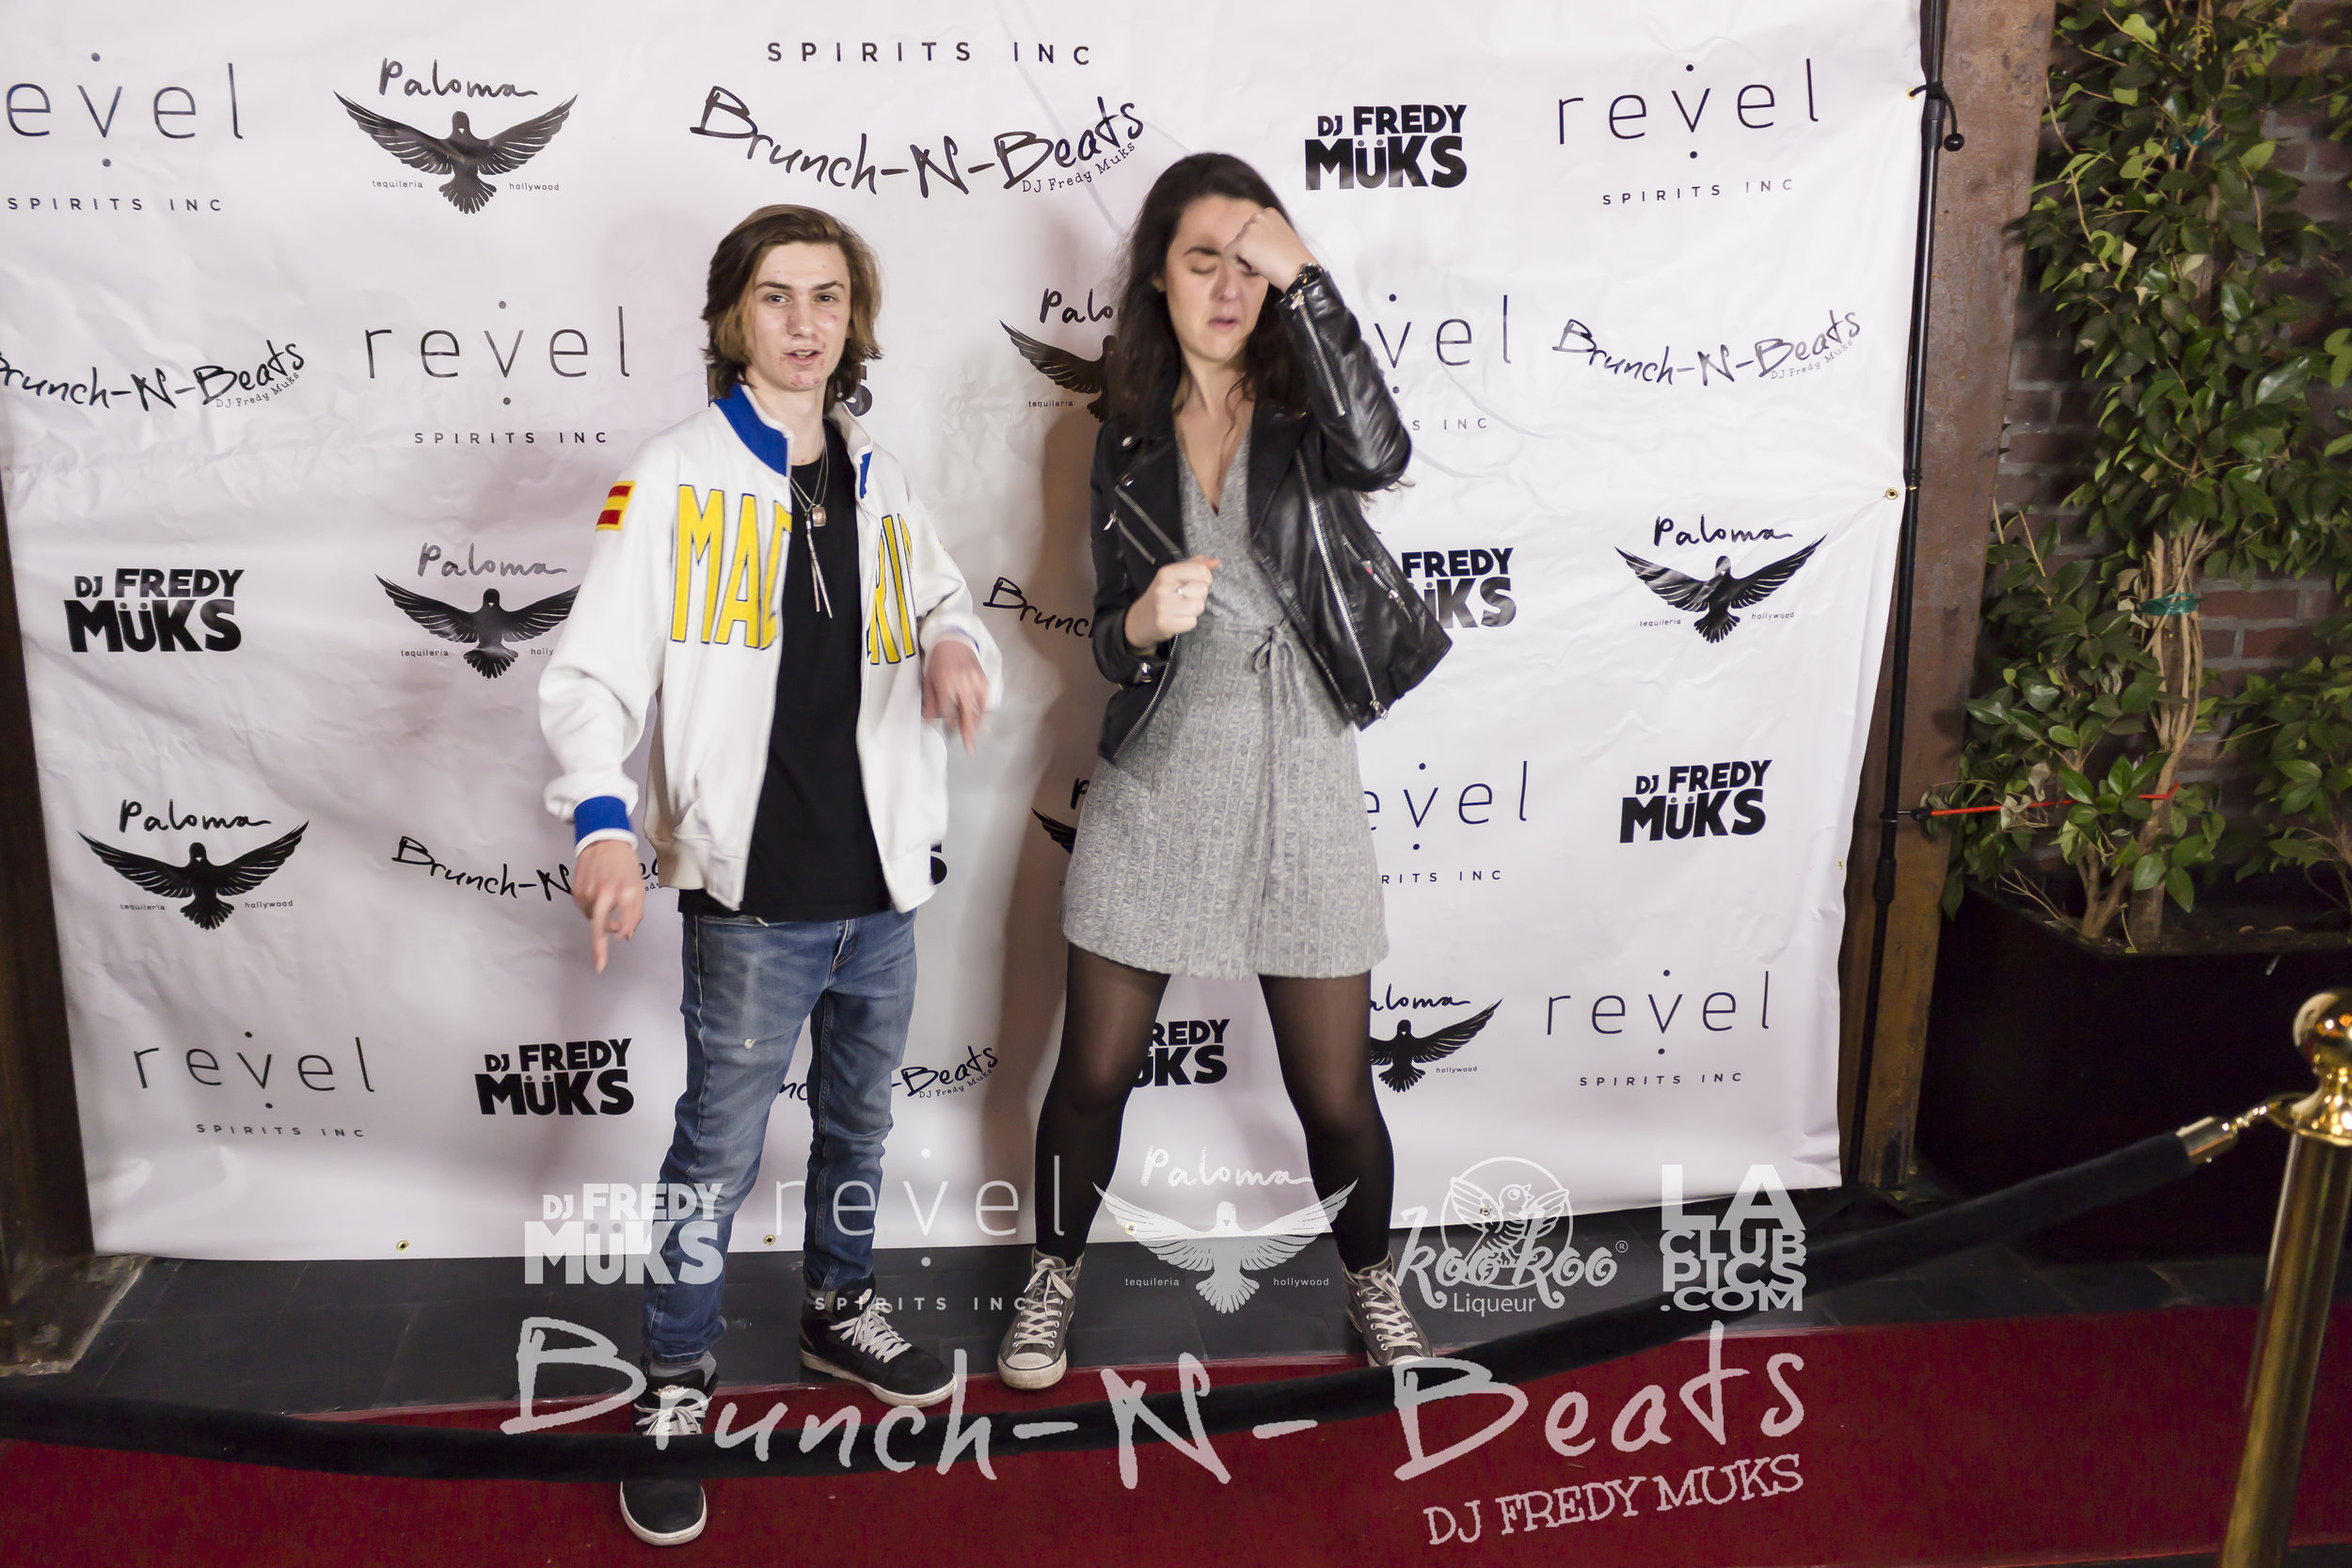 Brunch-N-Beats - 03-11-18_163.jpg